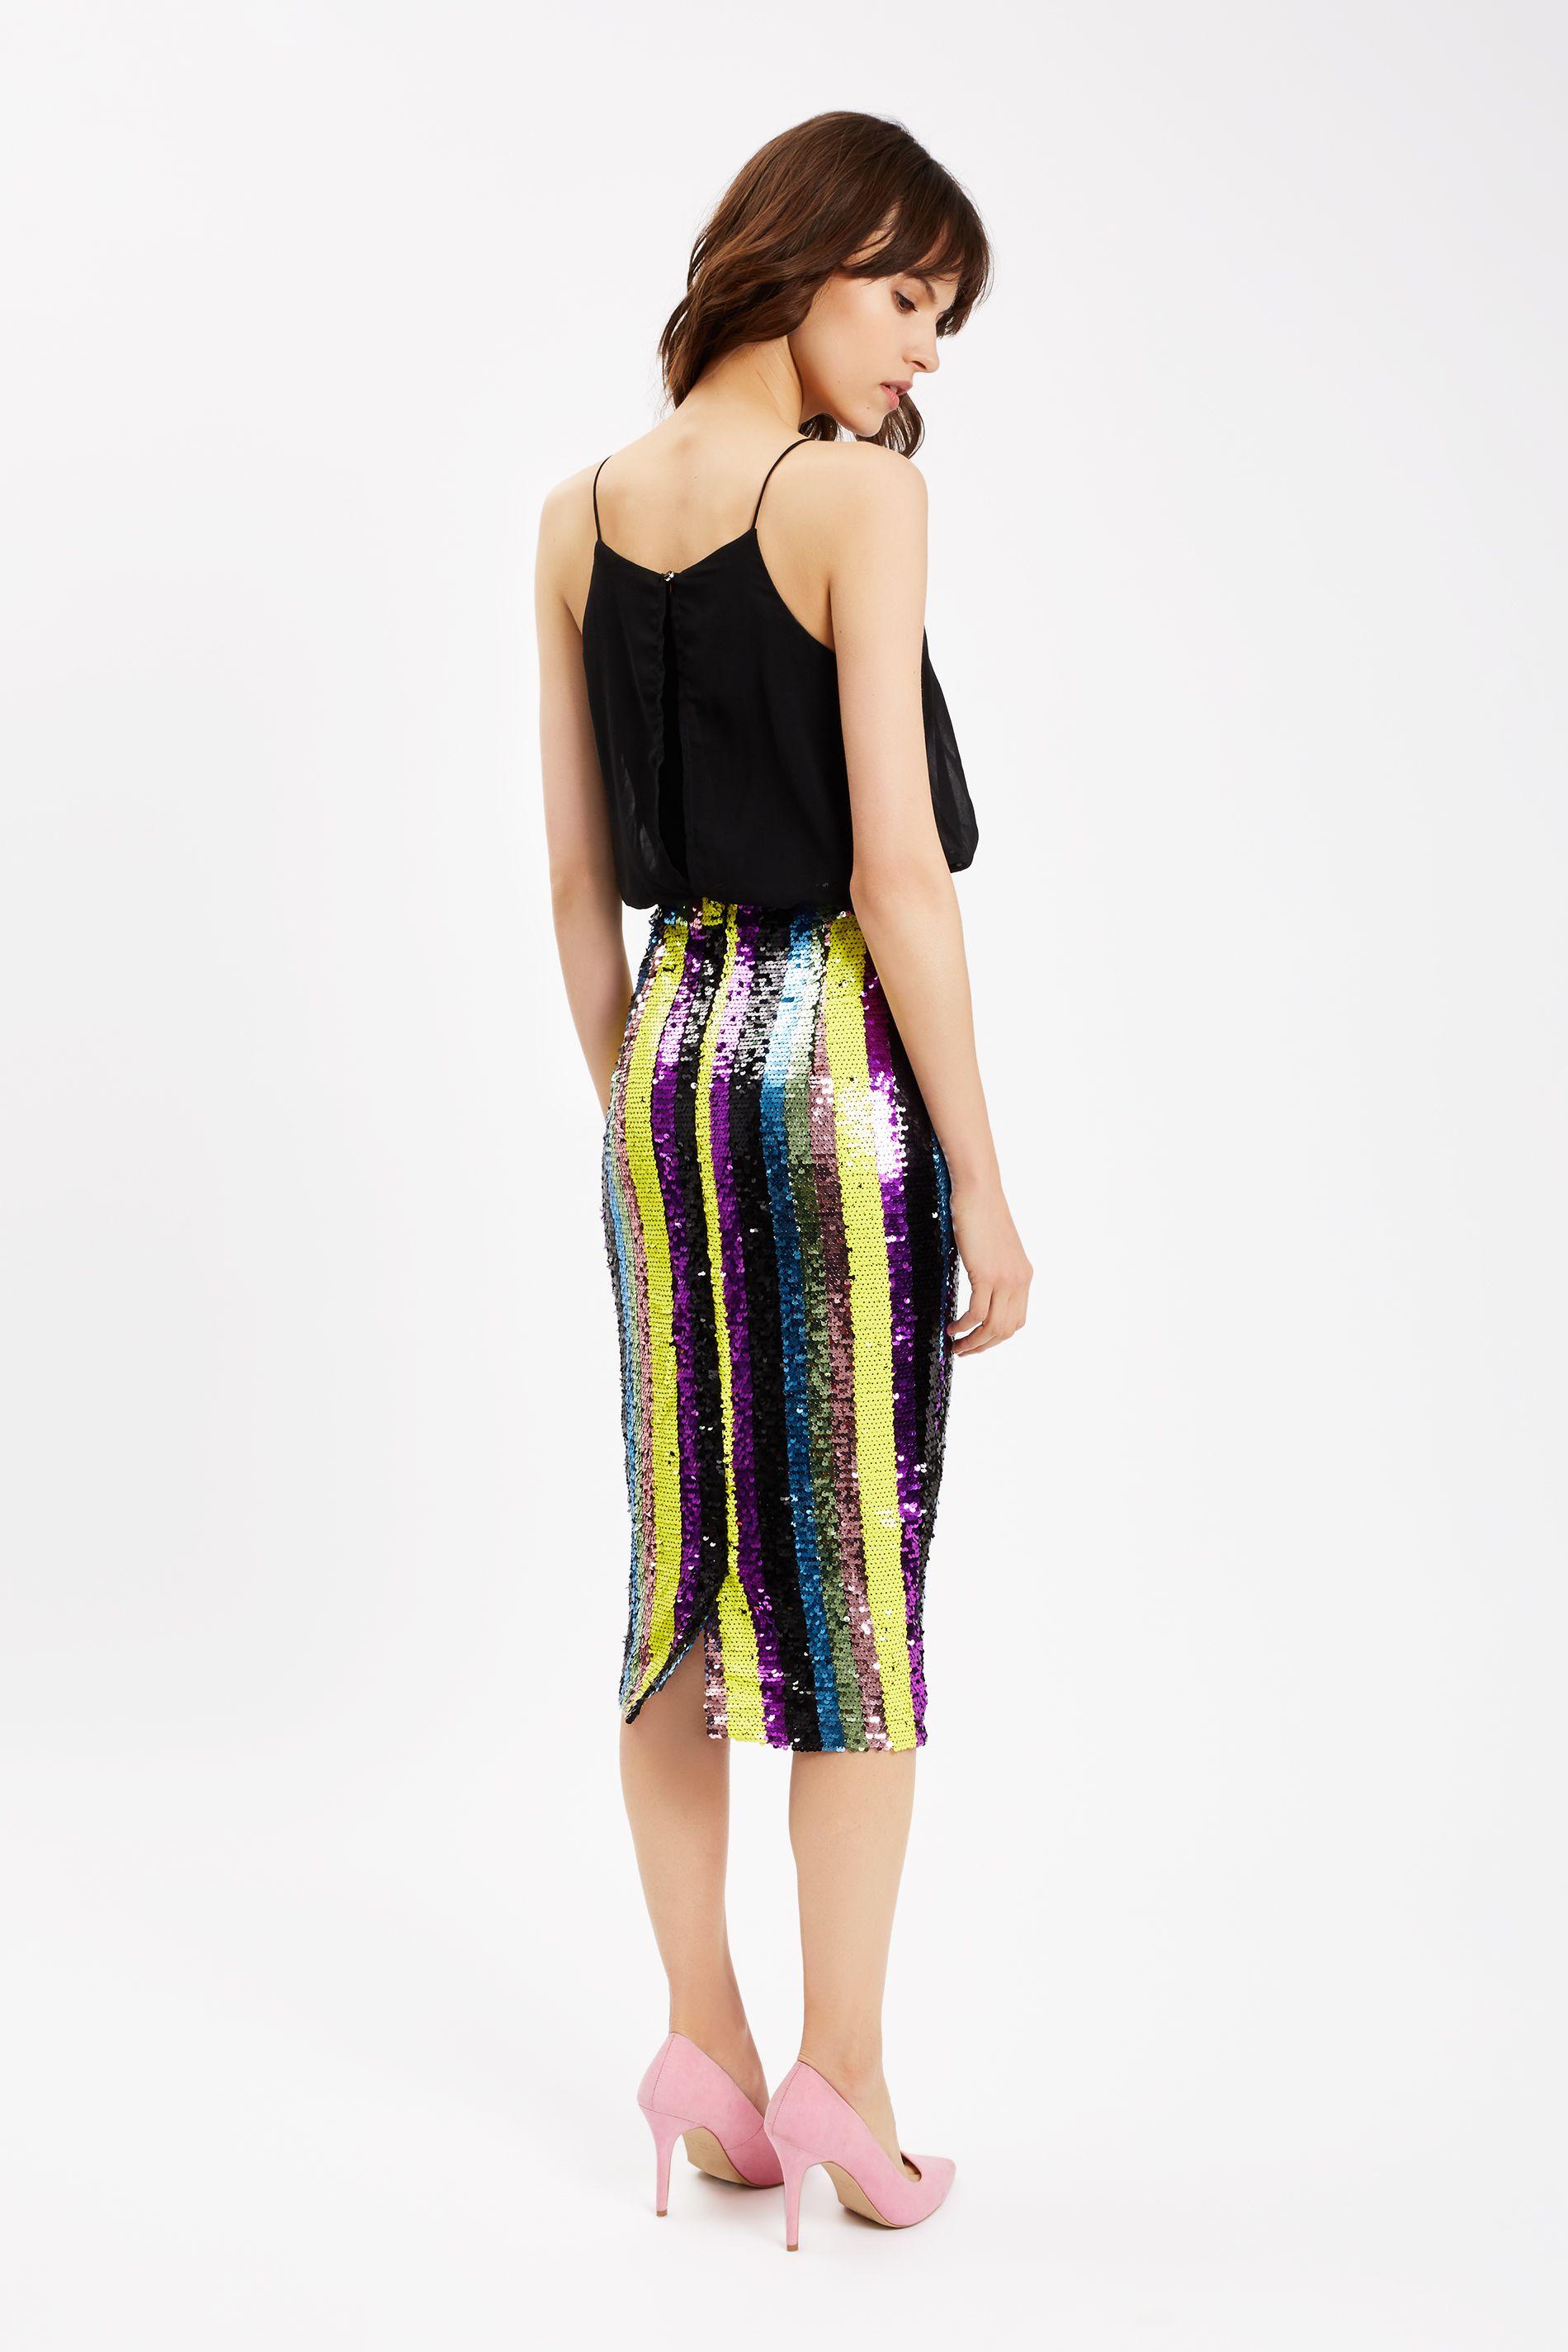 Rainbow Ricochet Sequin Pencil Dress in Black